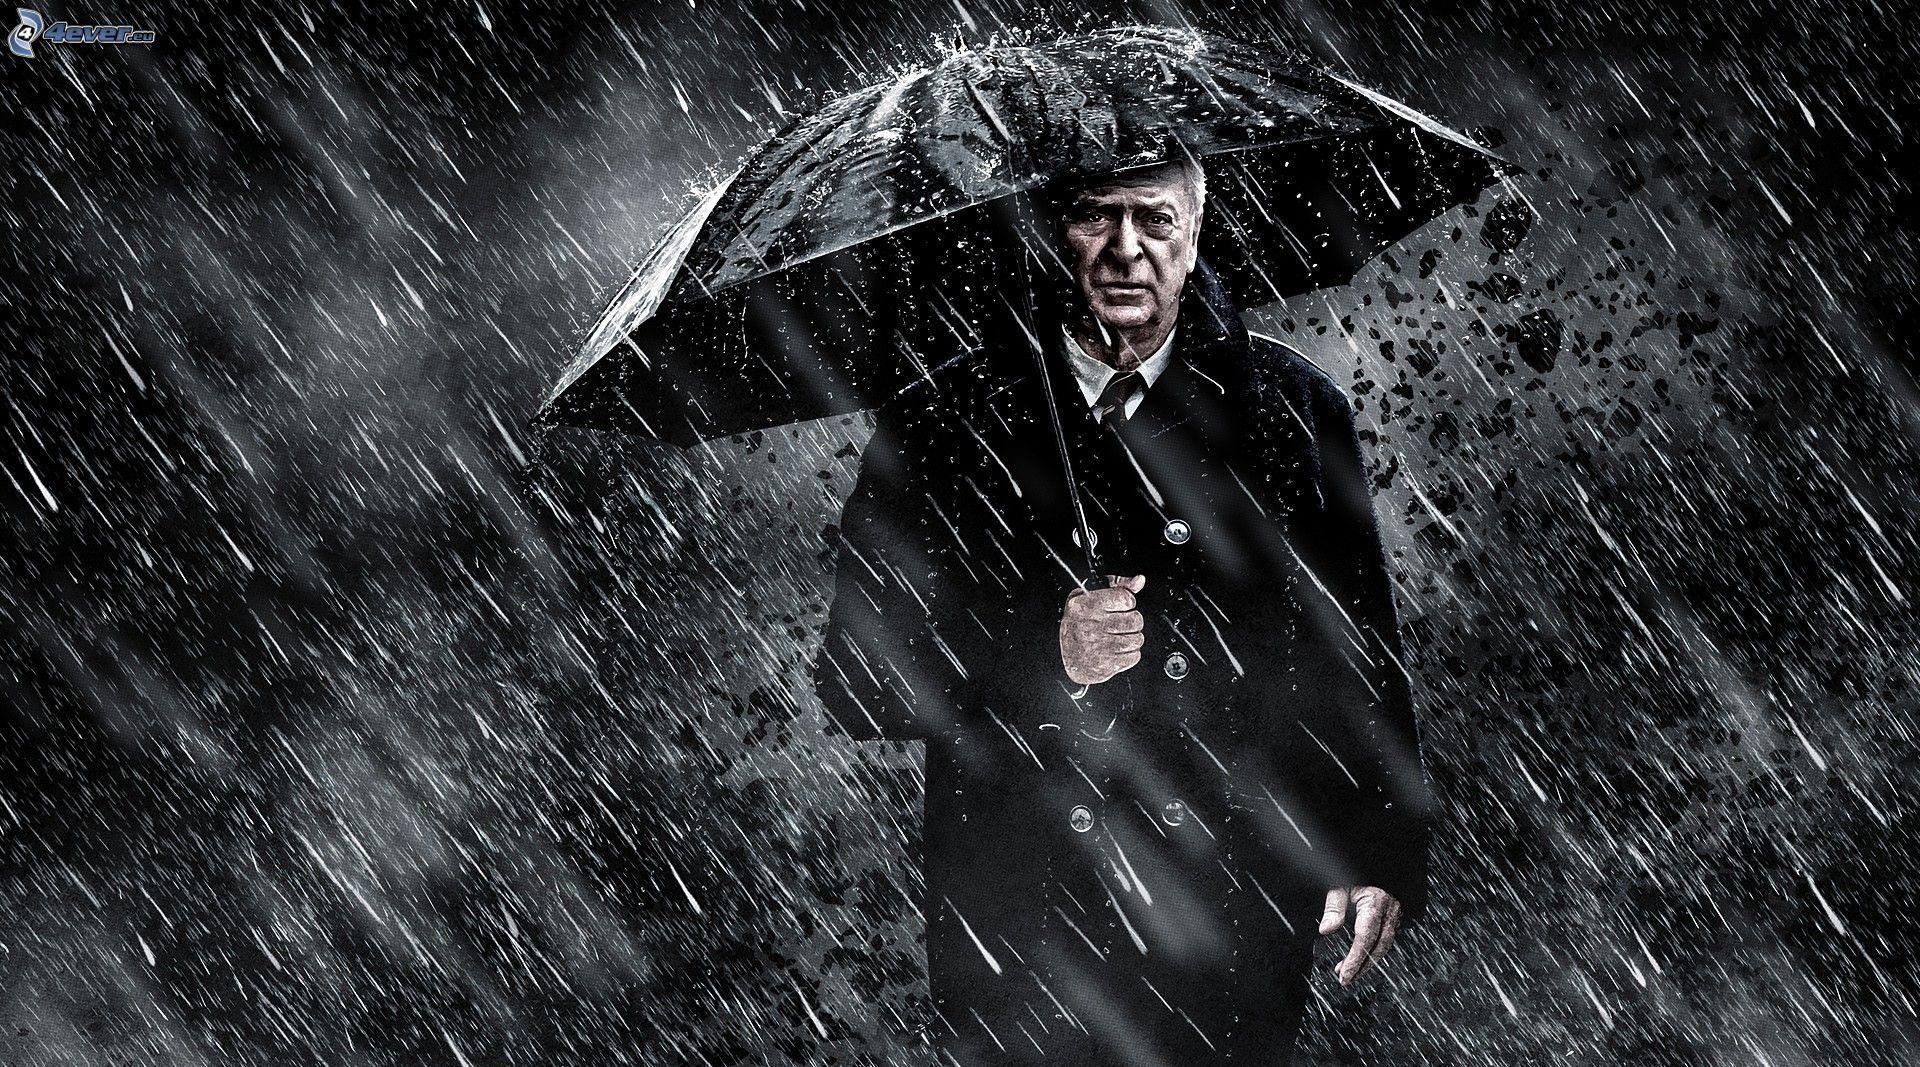 Una noche de lluvia The-dark-knight,-homme,-parapluie,-pluie-184832